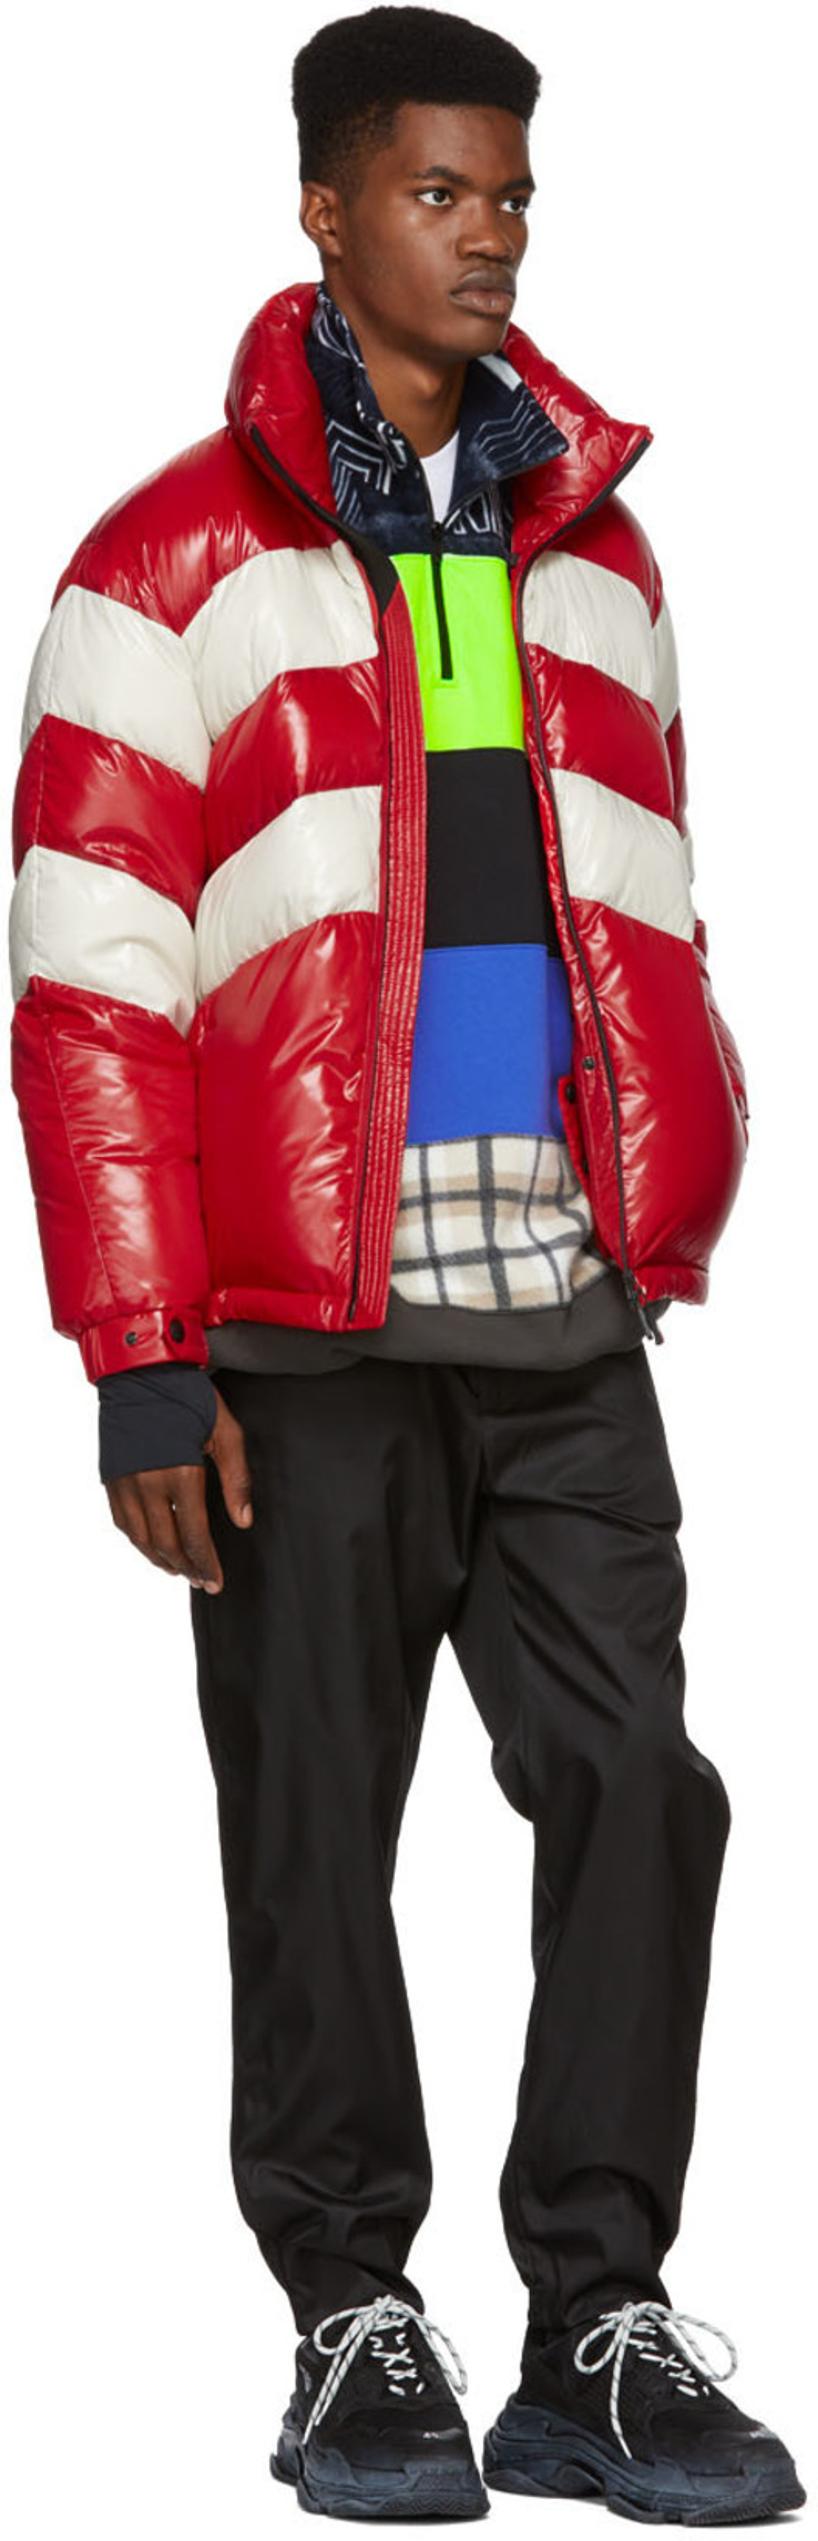 0e7e0361fea0 Moncler Grenoble Golzern Nylon Laque Down Jacket In Red